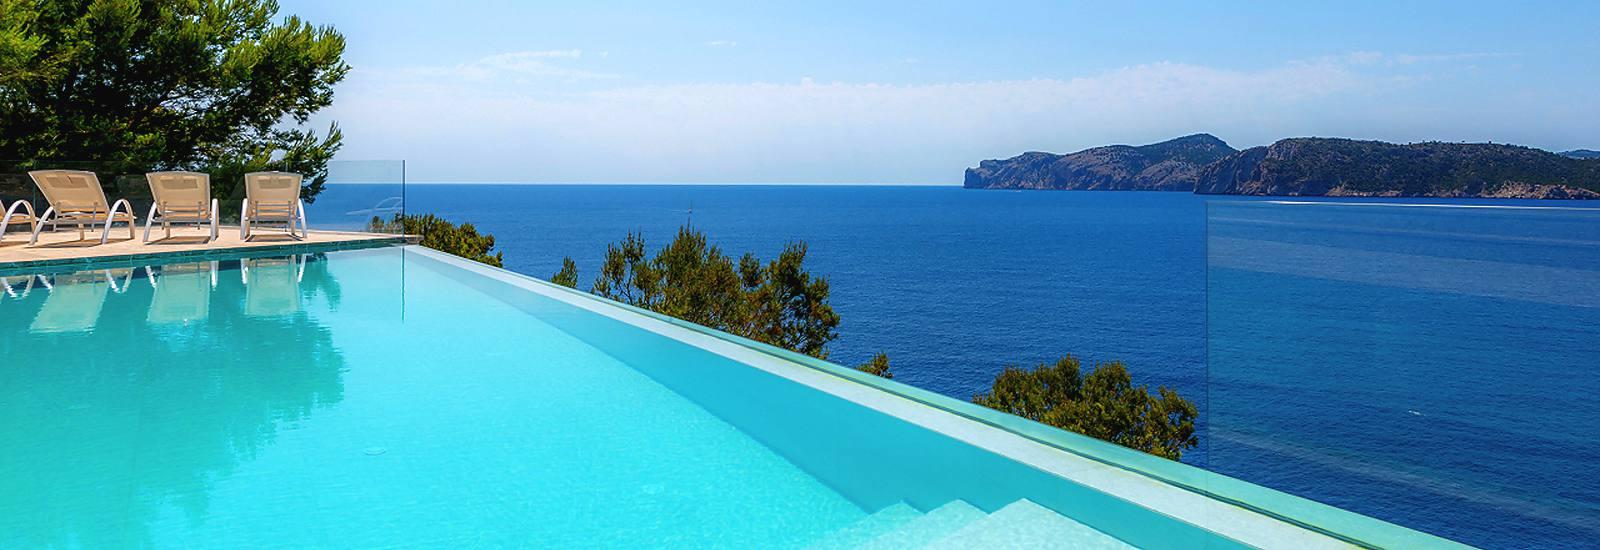 luxus finca mallorca mieten villa ferienhaus ferienwohnung. Black Bedroom Furniture Sets. Home Design Ideas